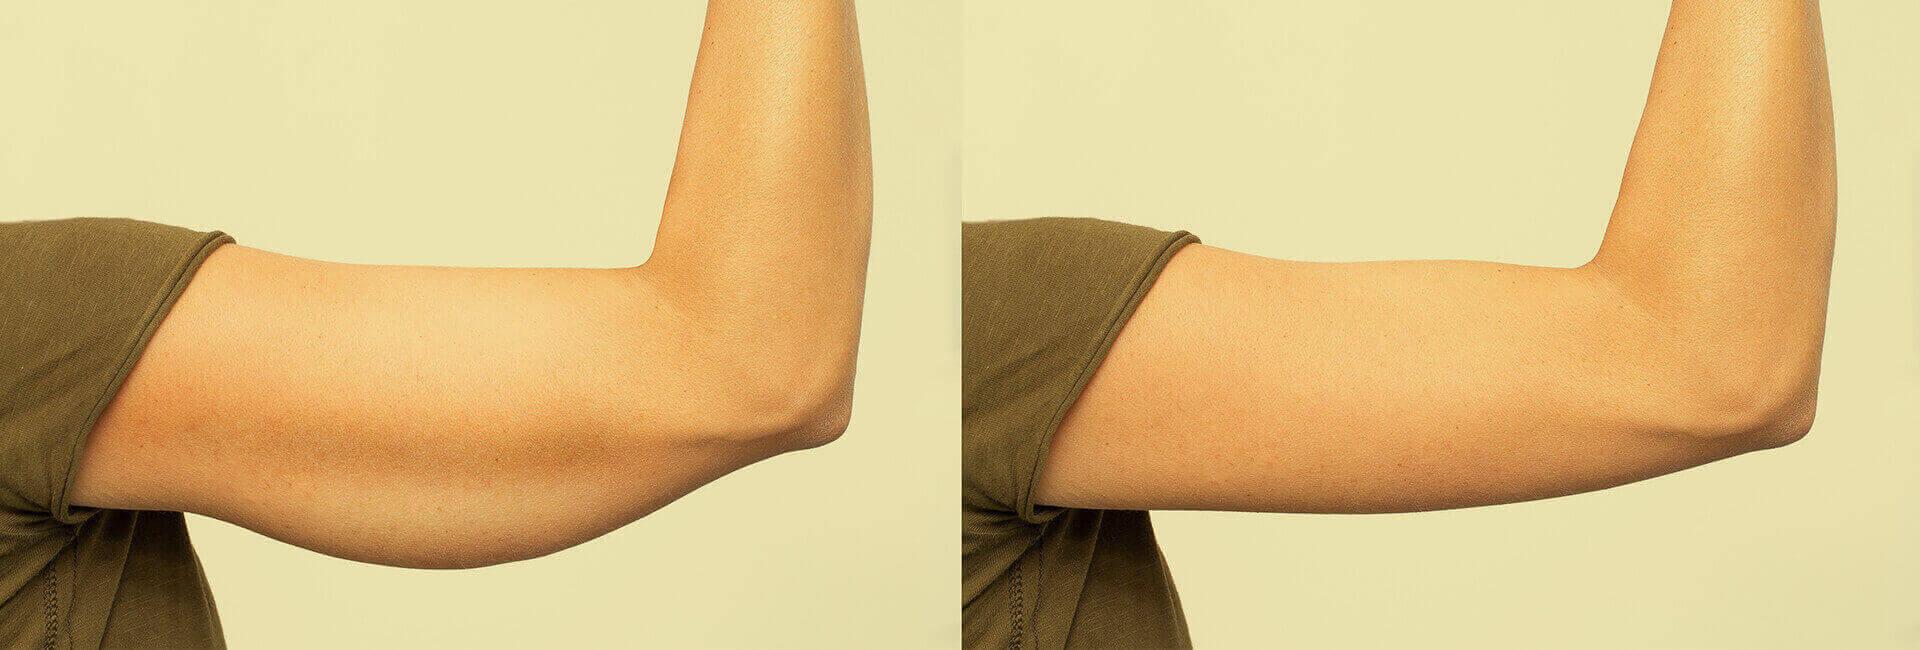 Arms.jpg